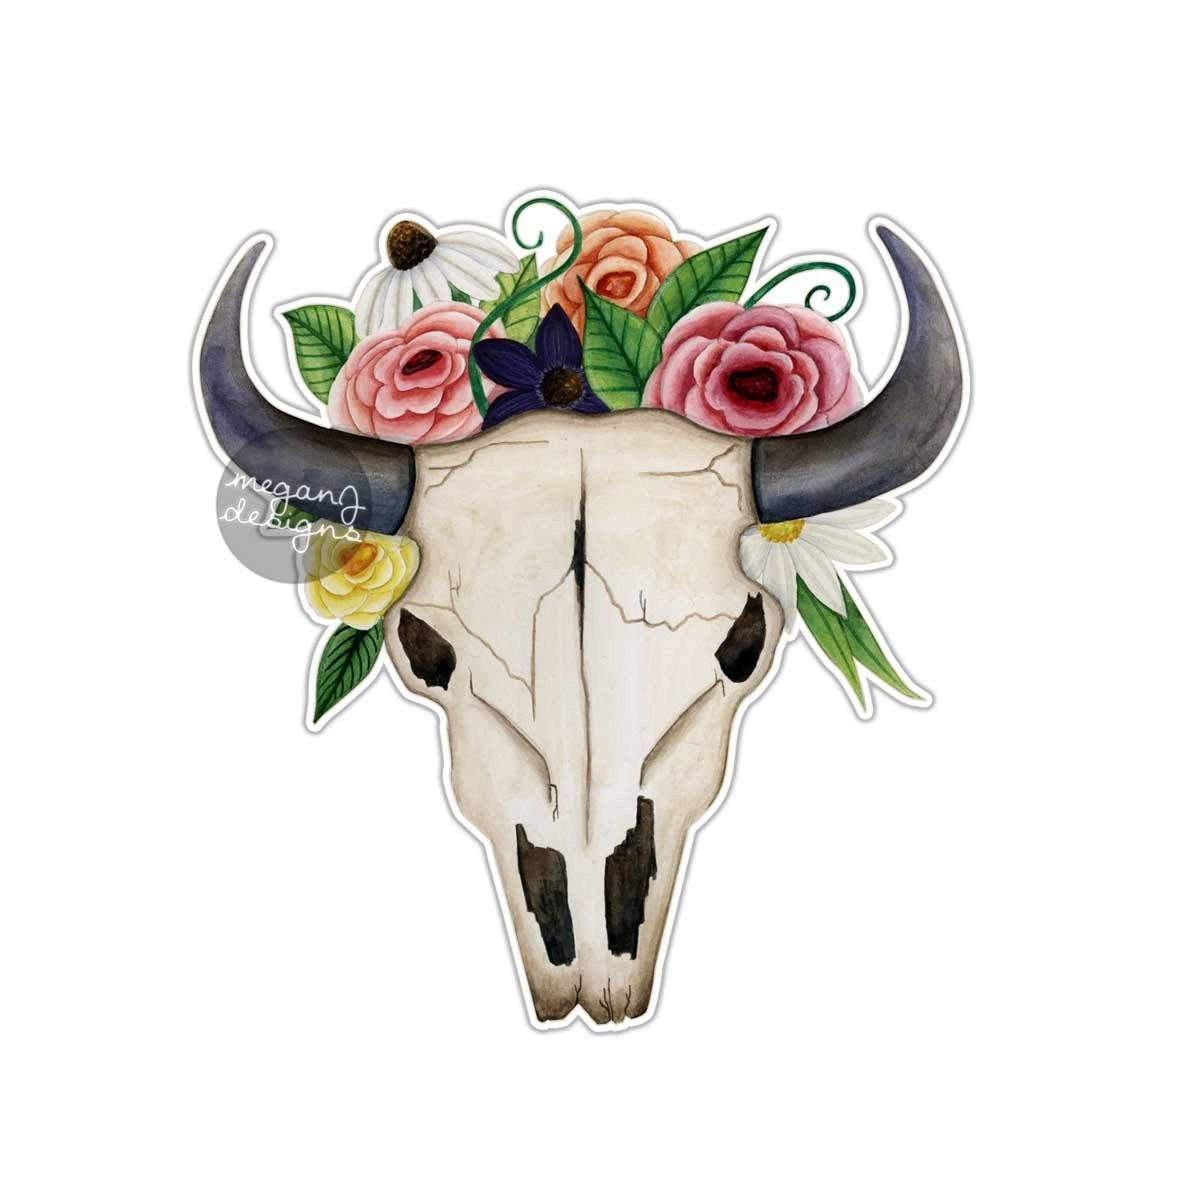 Bull Skull With Flowers Sticker Cow Longhorn Skull Car Decal